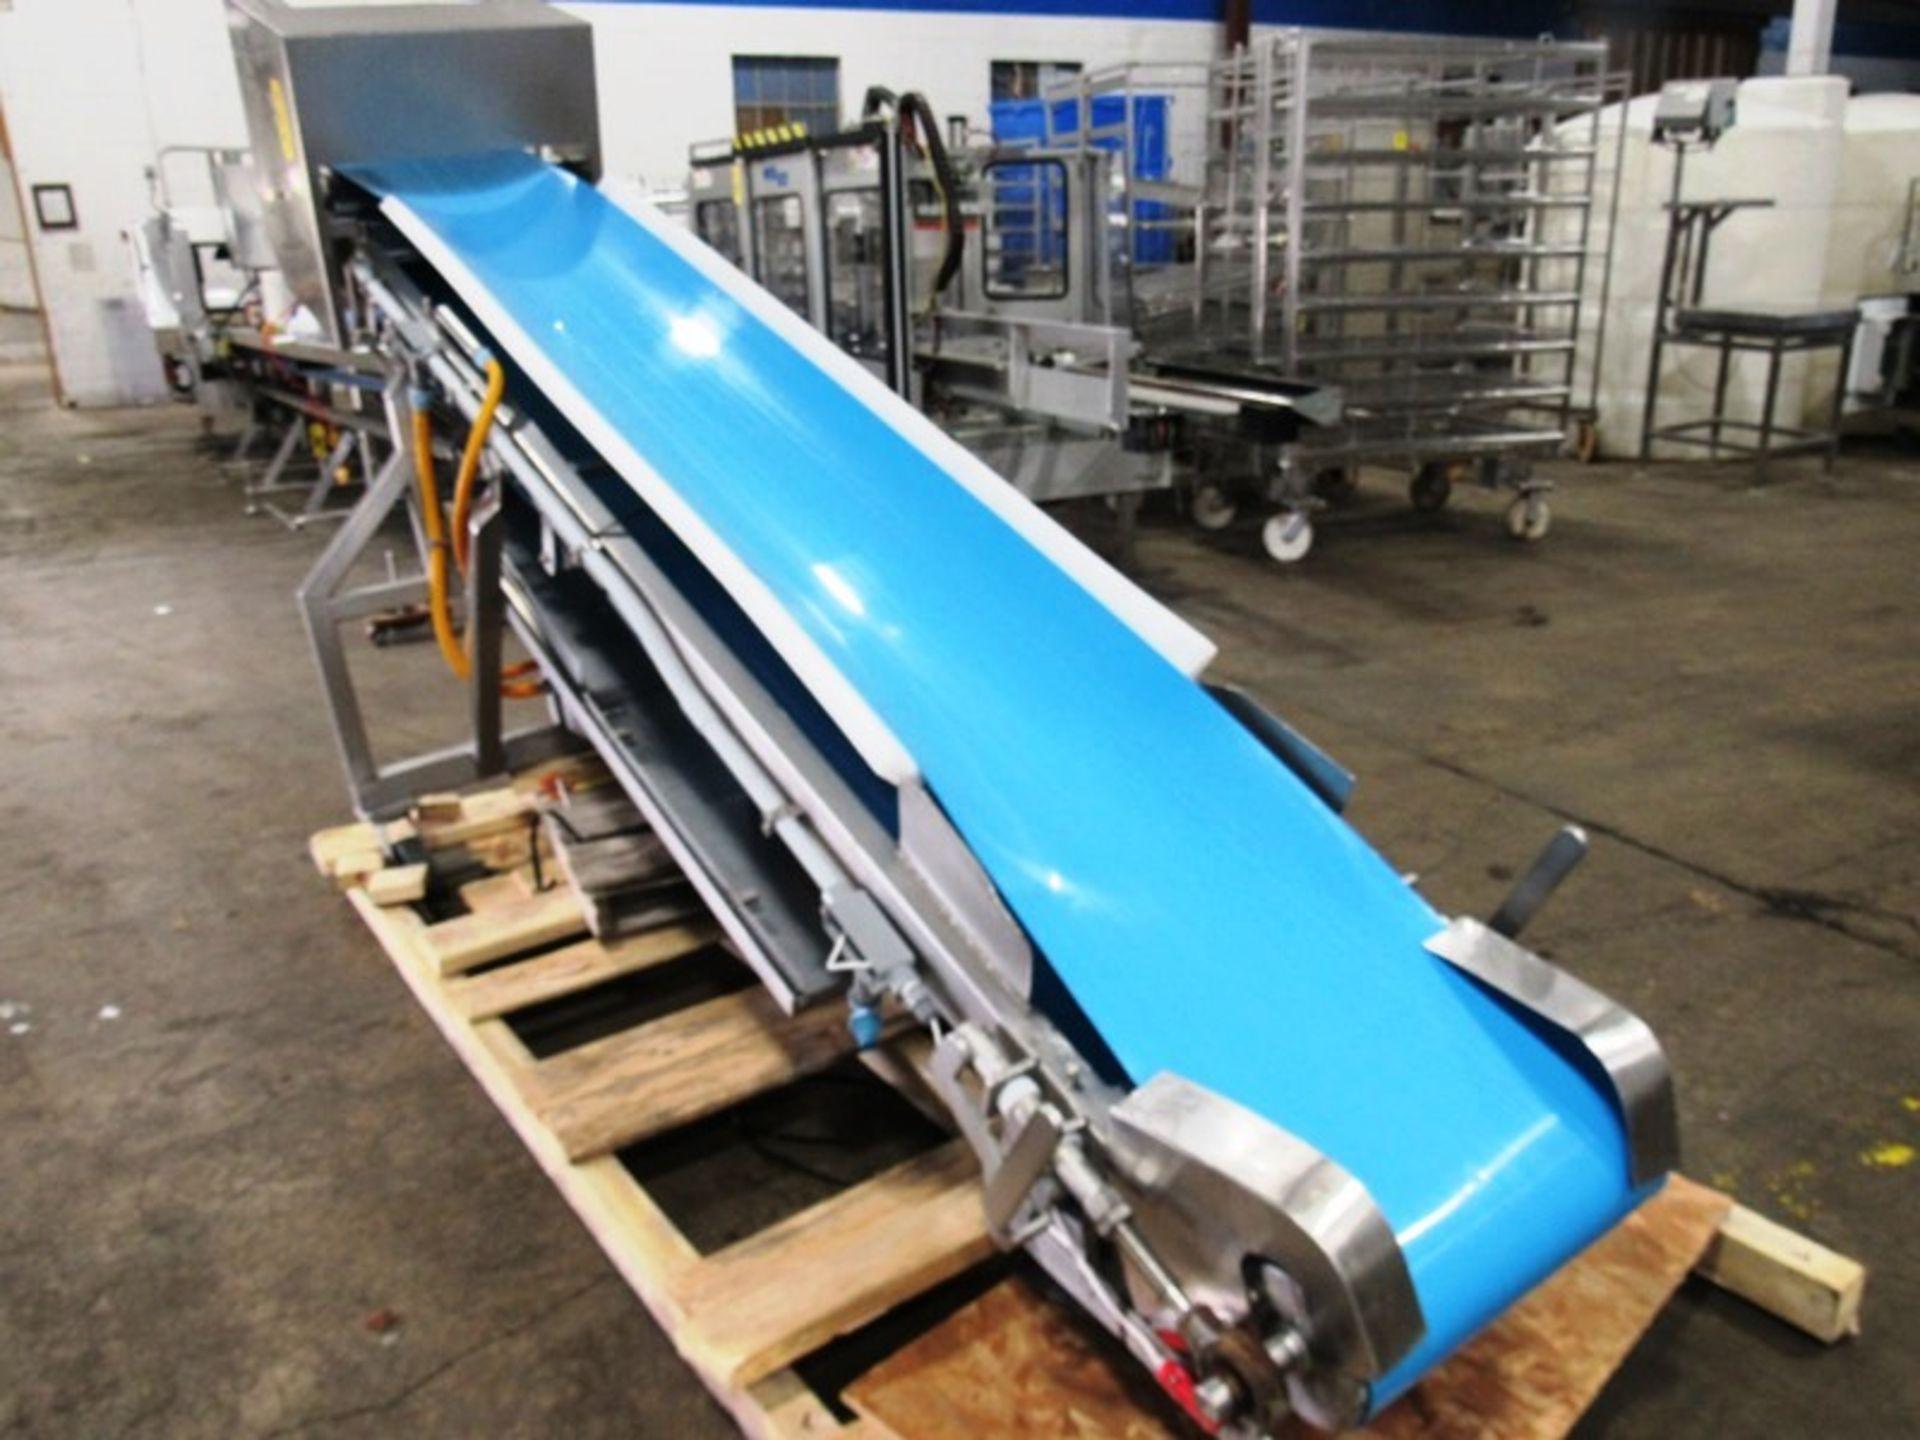 "Stainless Steel Incline Conveyor, 18"" Wide X 11' Long neoprene beltk 12"" inveed, 5' discharge, drum"